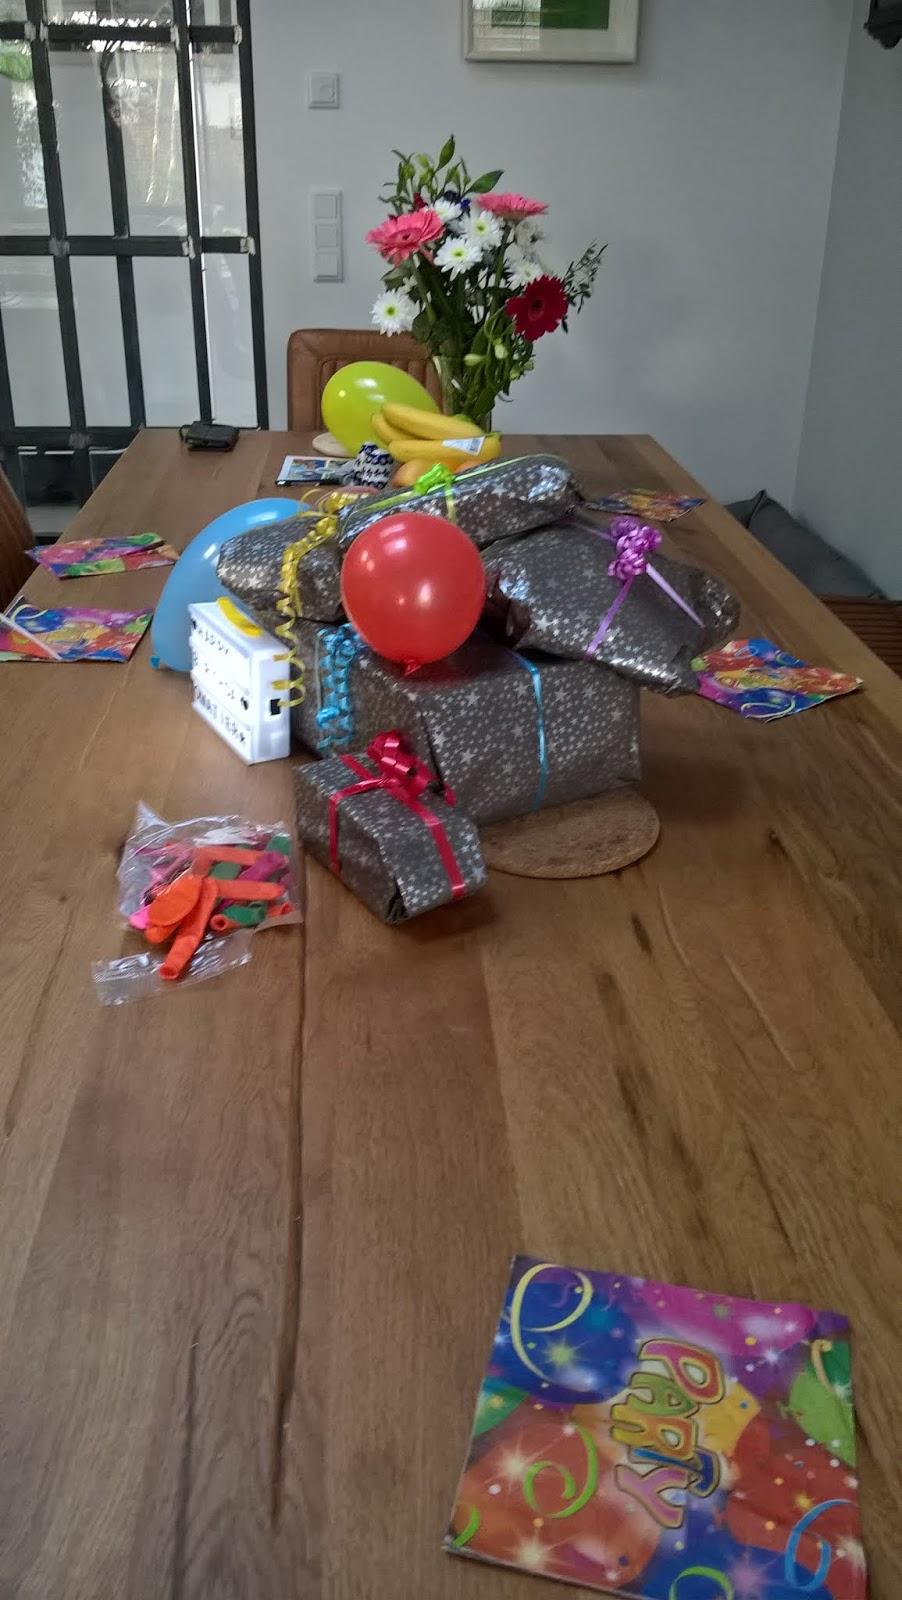 Corona Geburtstagsfeier Erlaubt